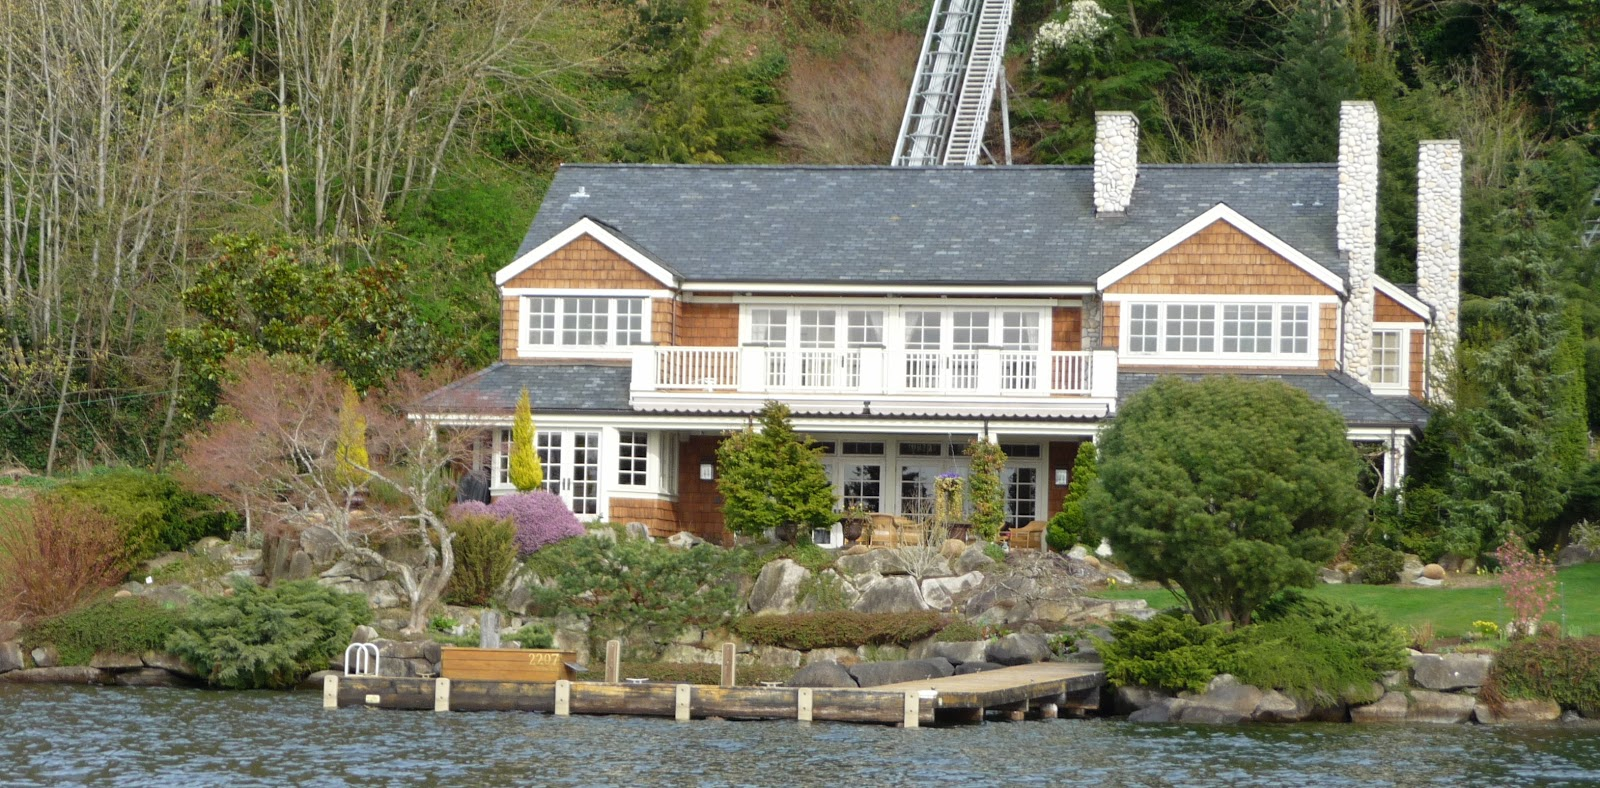 Seattle Mansions: Medina West Coast Home For Sale - $8 8 Million